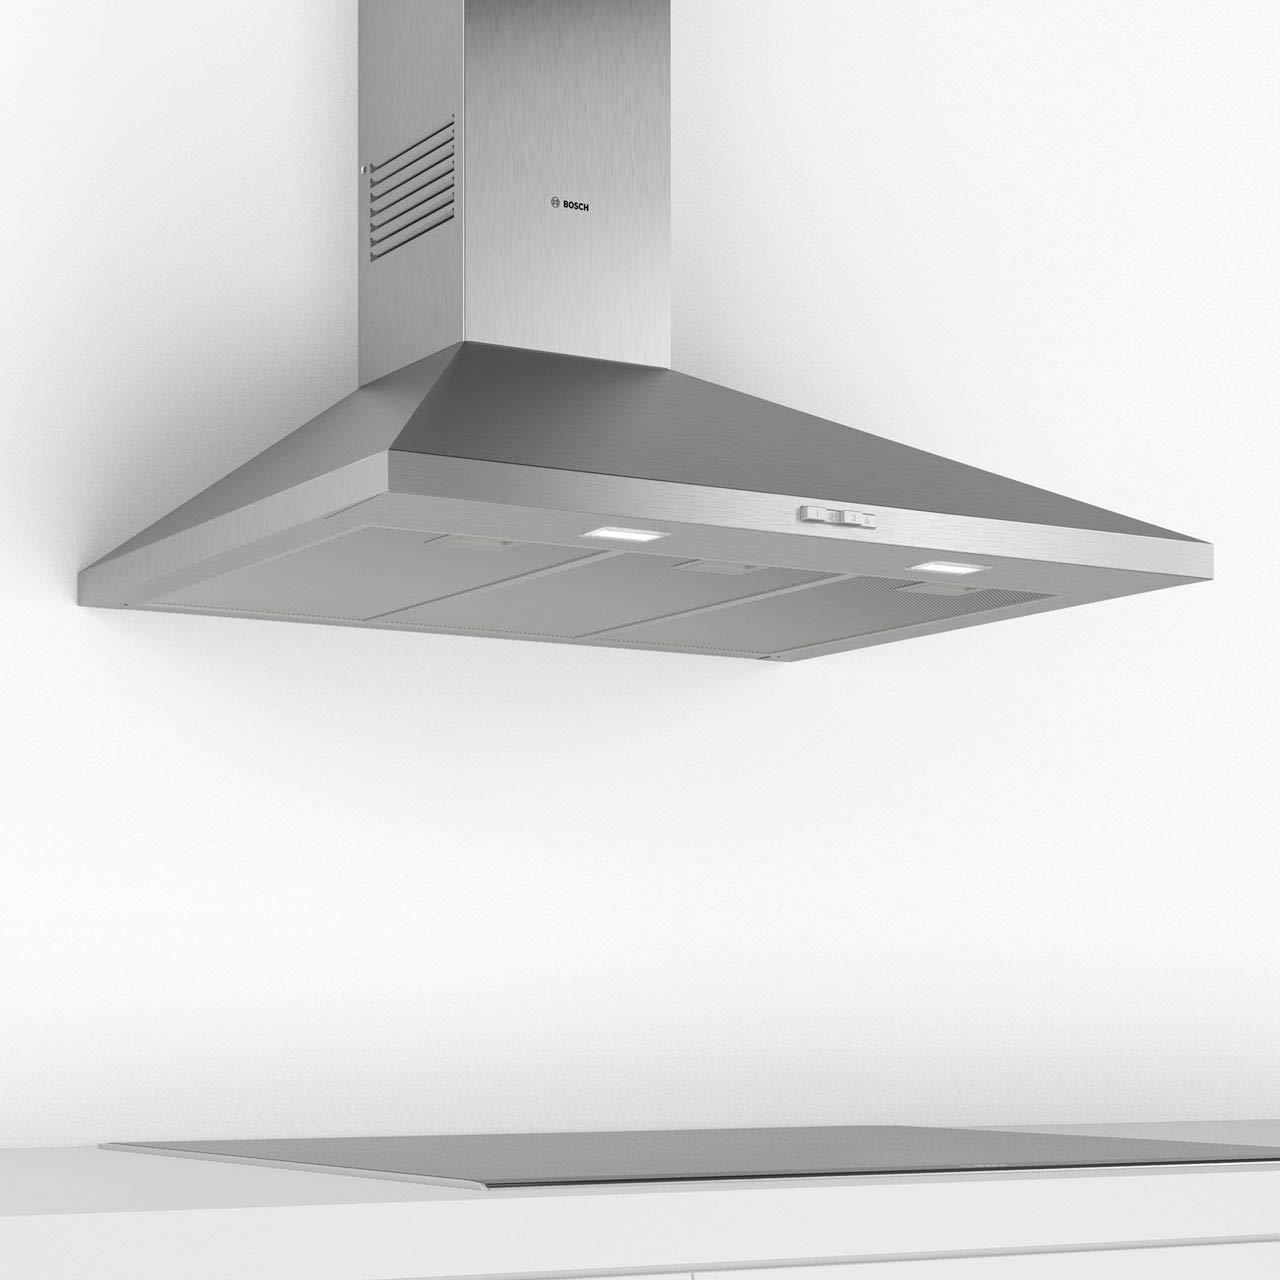 Bosch DWP94BC50B - Campana extractora de chimenea tradicional (90 cm, acero inoxidable): Amazon.es: Hogar